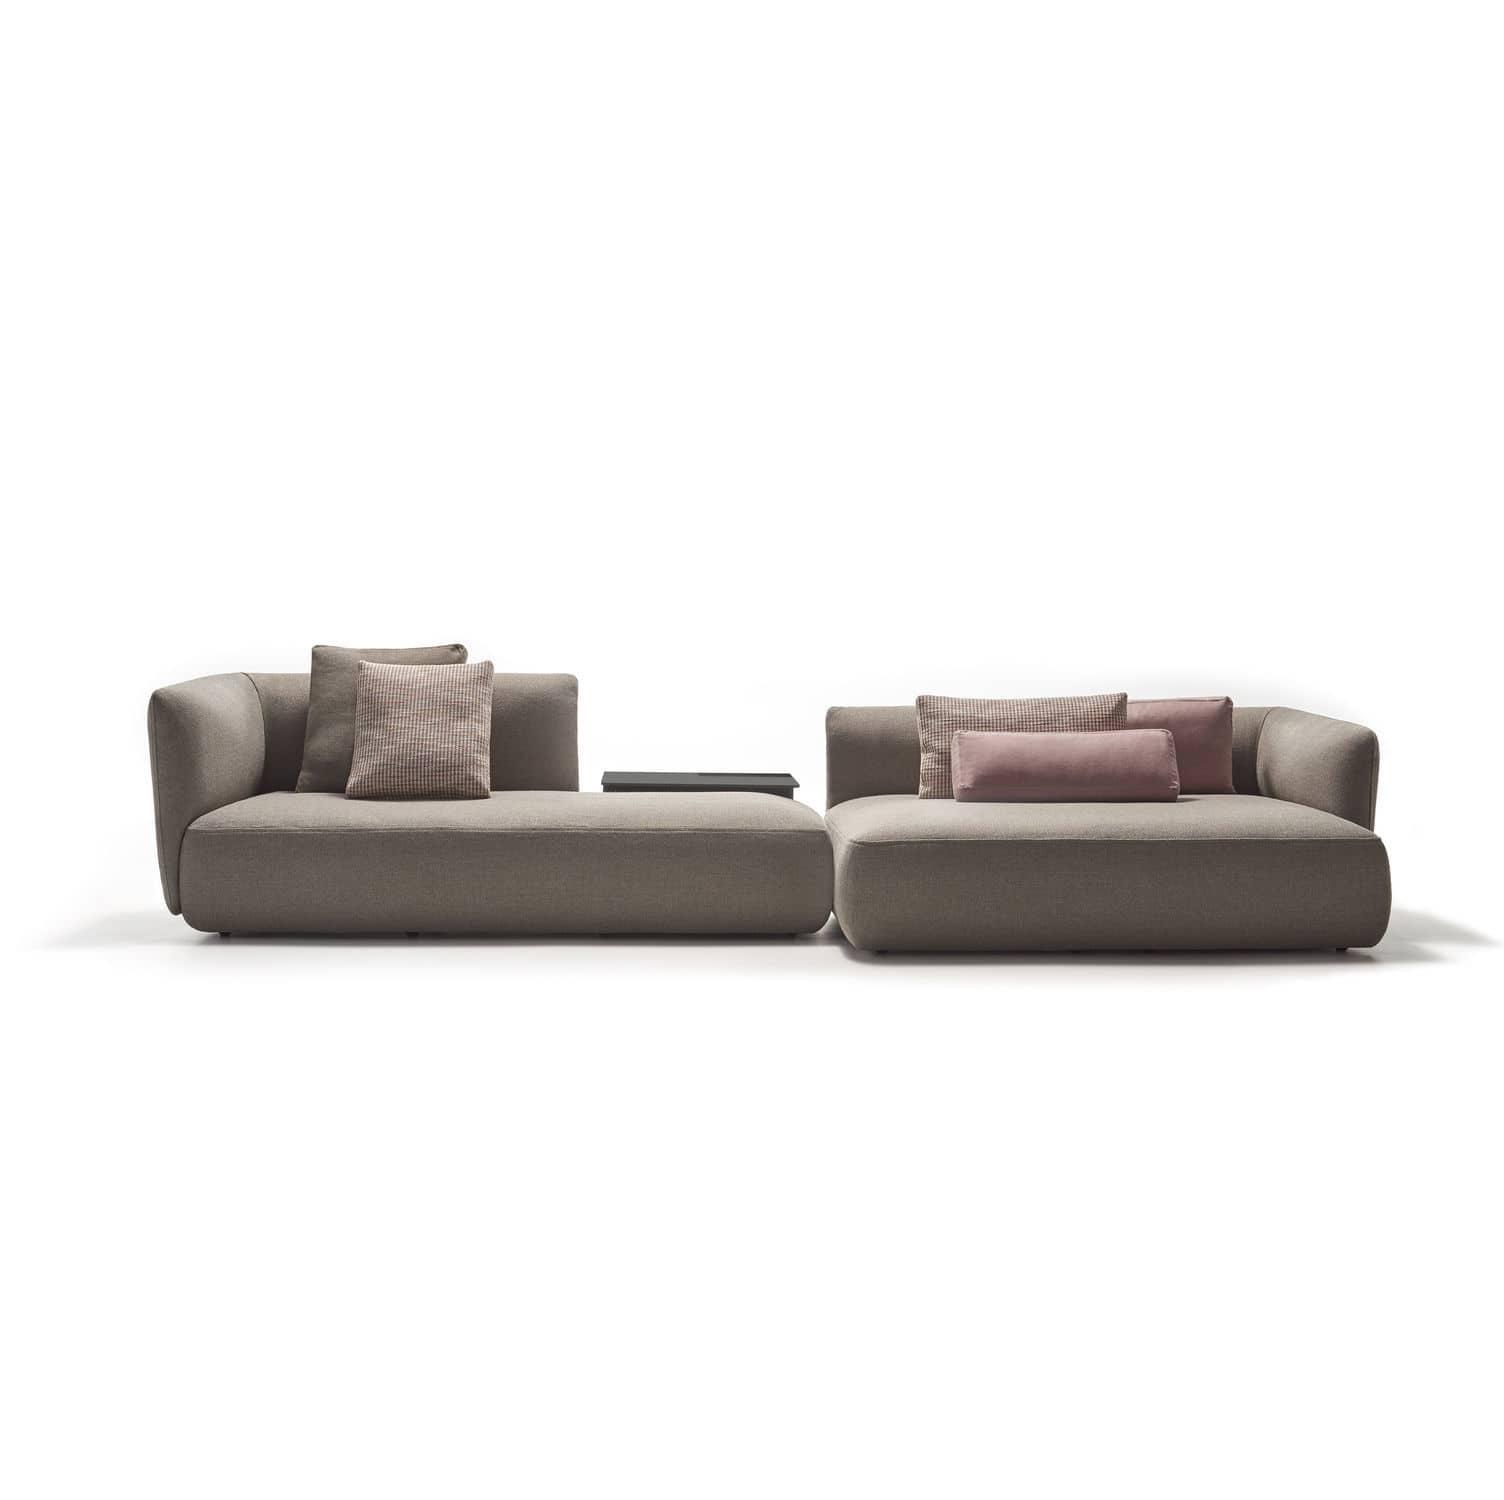 Modulierbares Sofa Eck Kompakt Modern Cosy By Francesco Rota